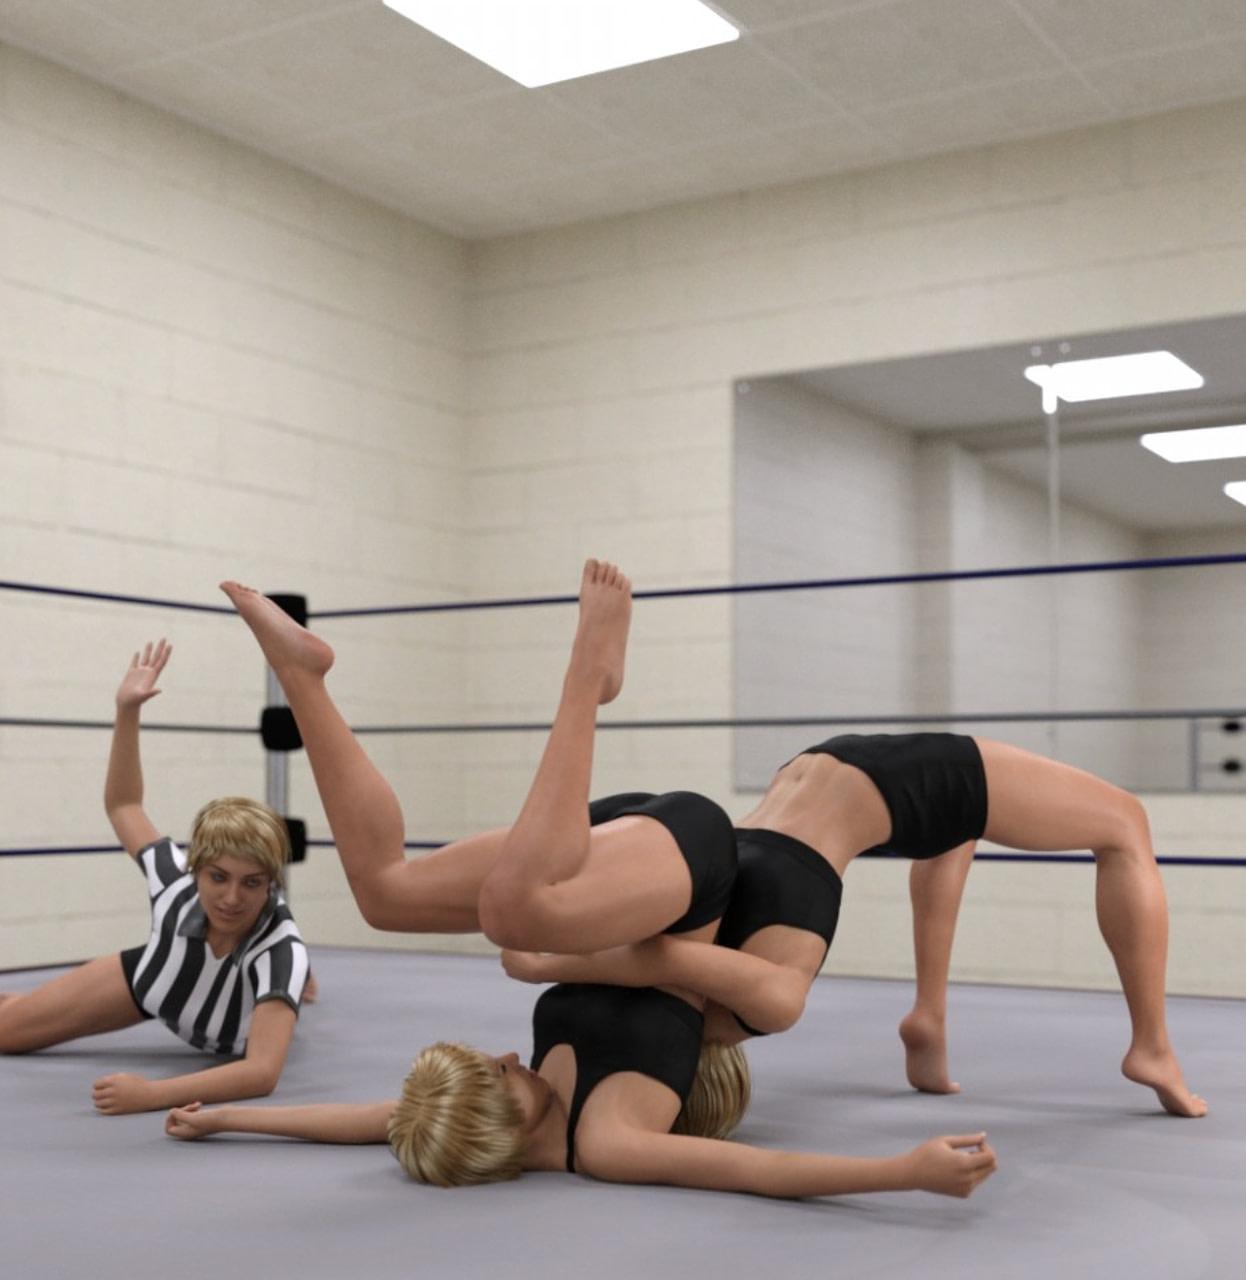 daz3d pro wrestling poses